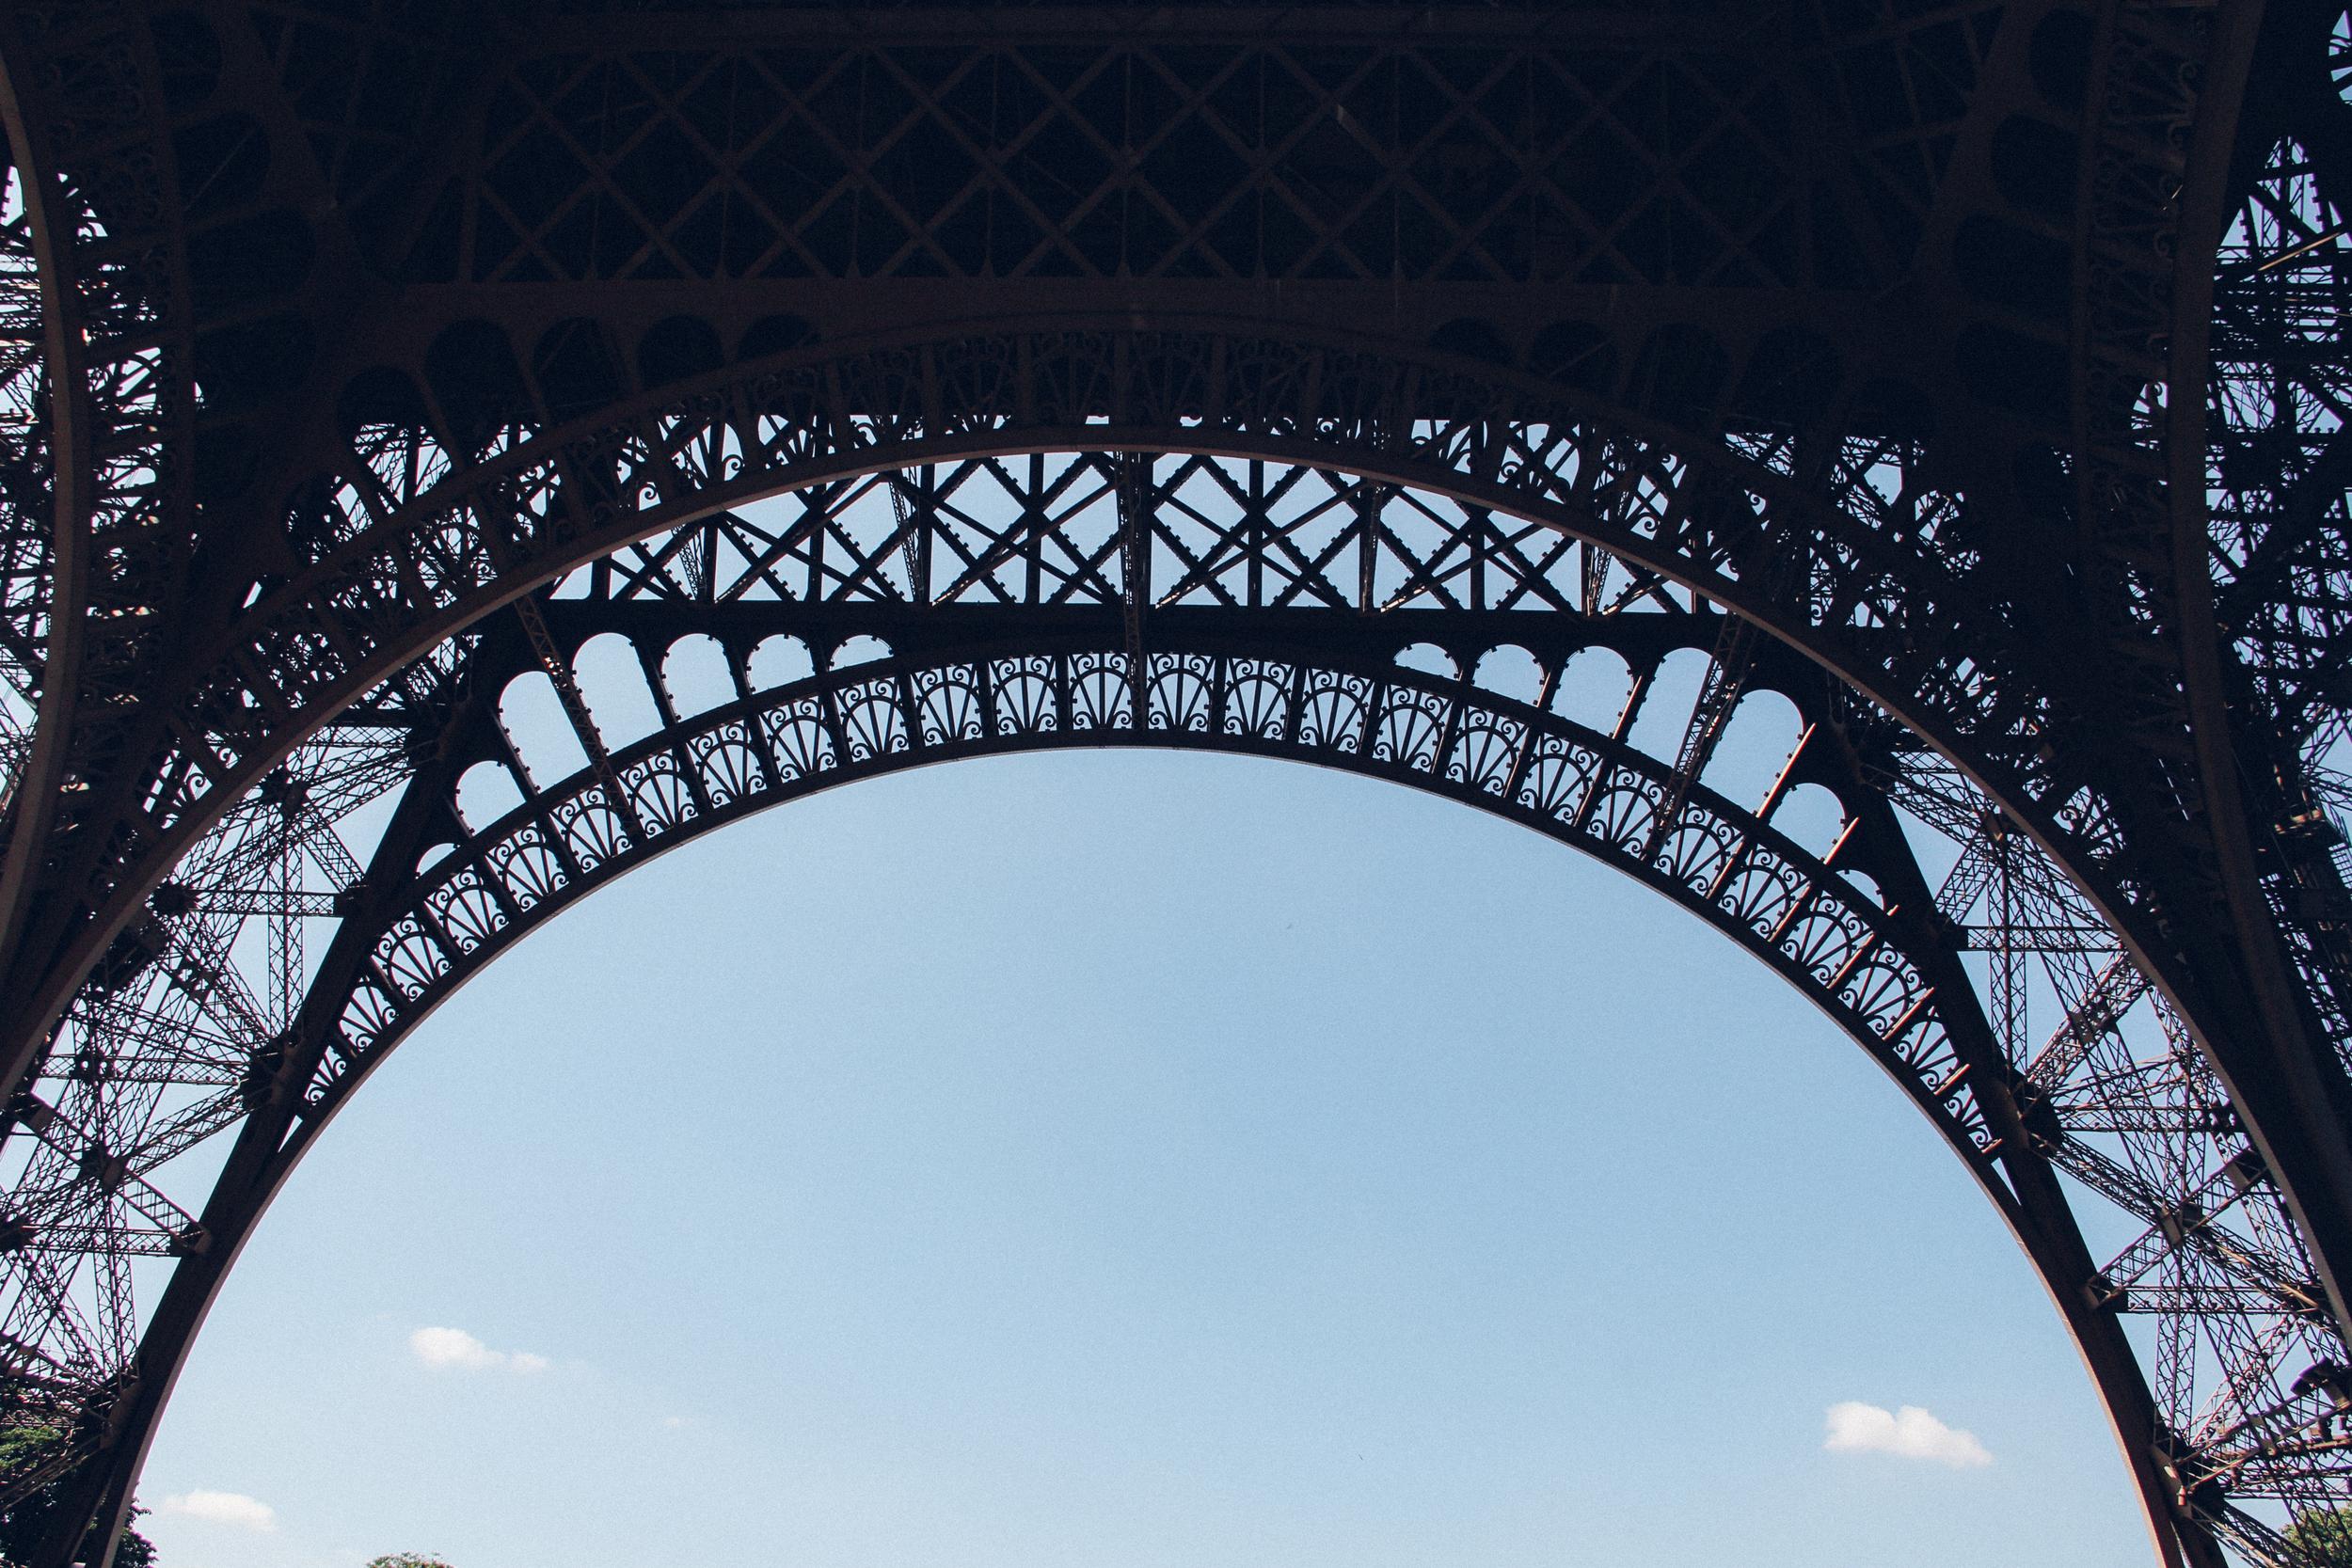 VegasTravelEurope_Paris_2015-11.jpg